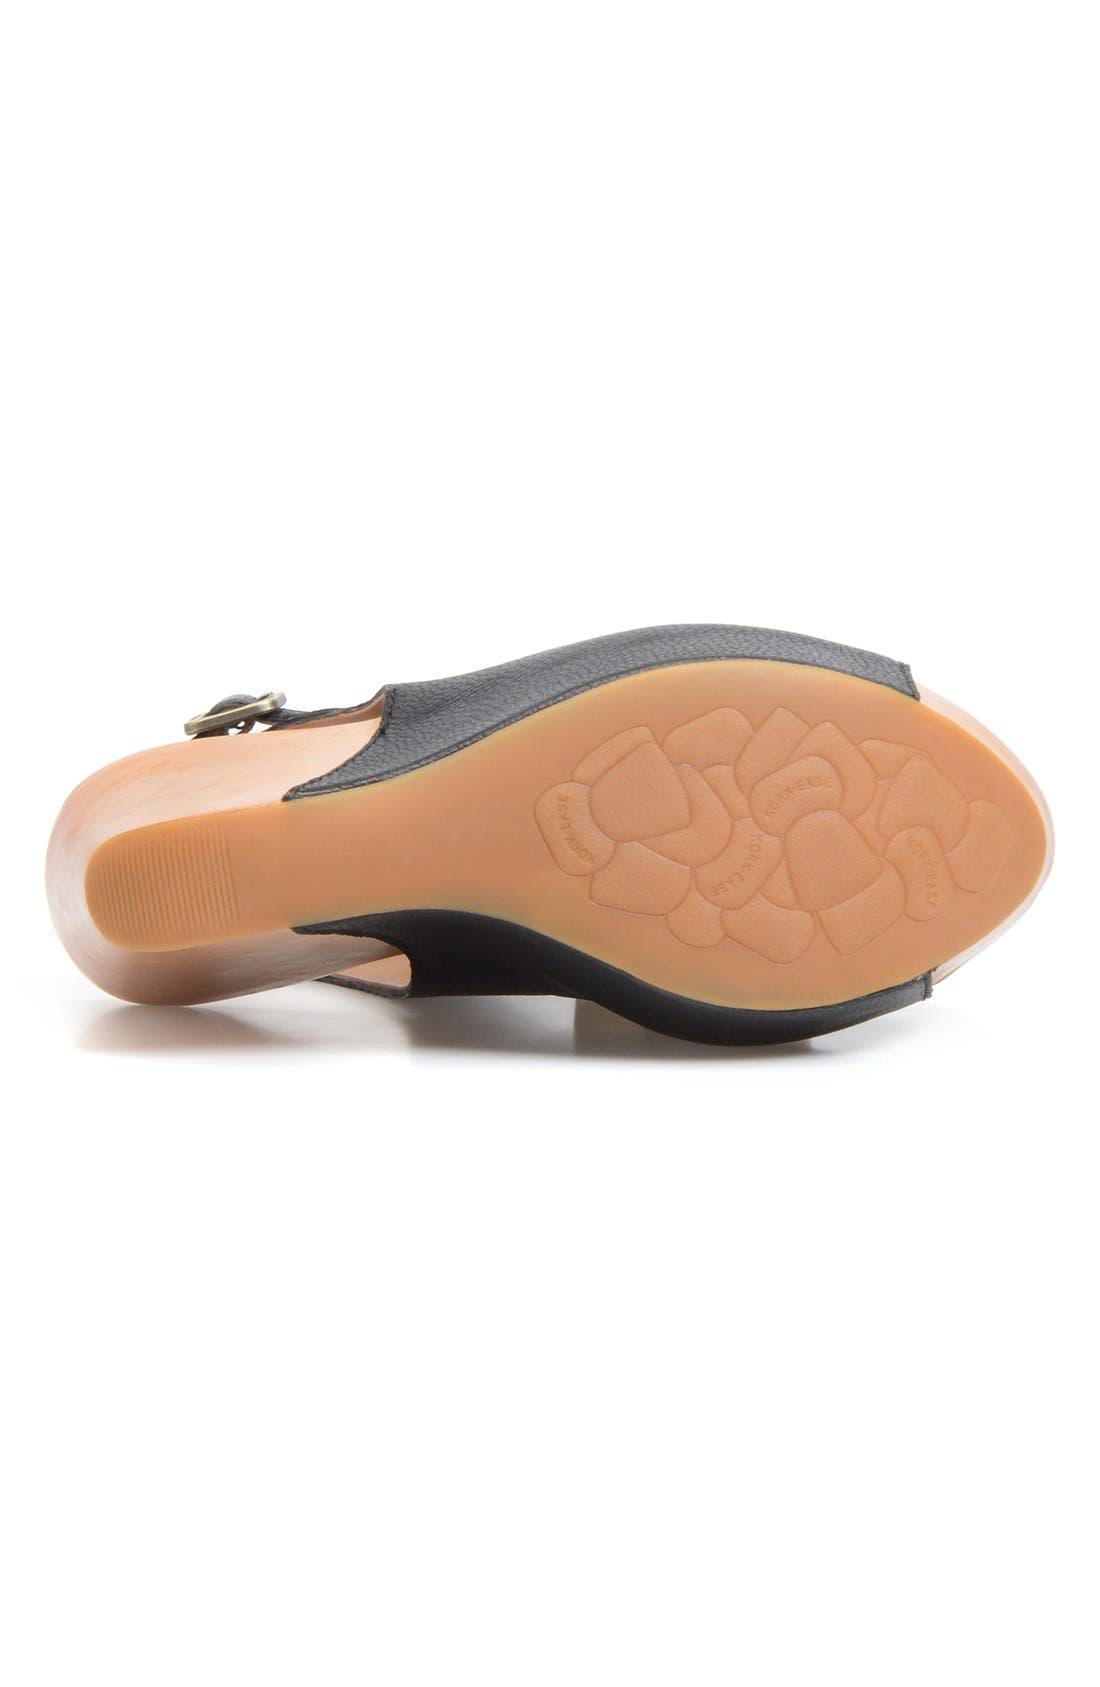 'Berit' Wedge Sandal,                             Alternate thumbnail 74, color,